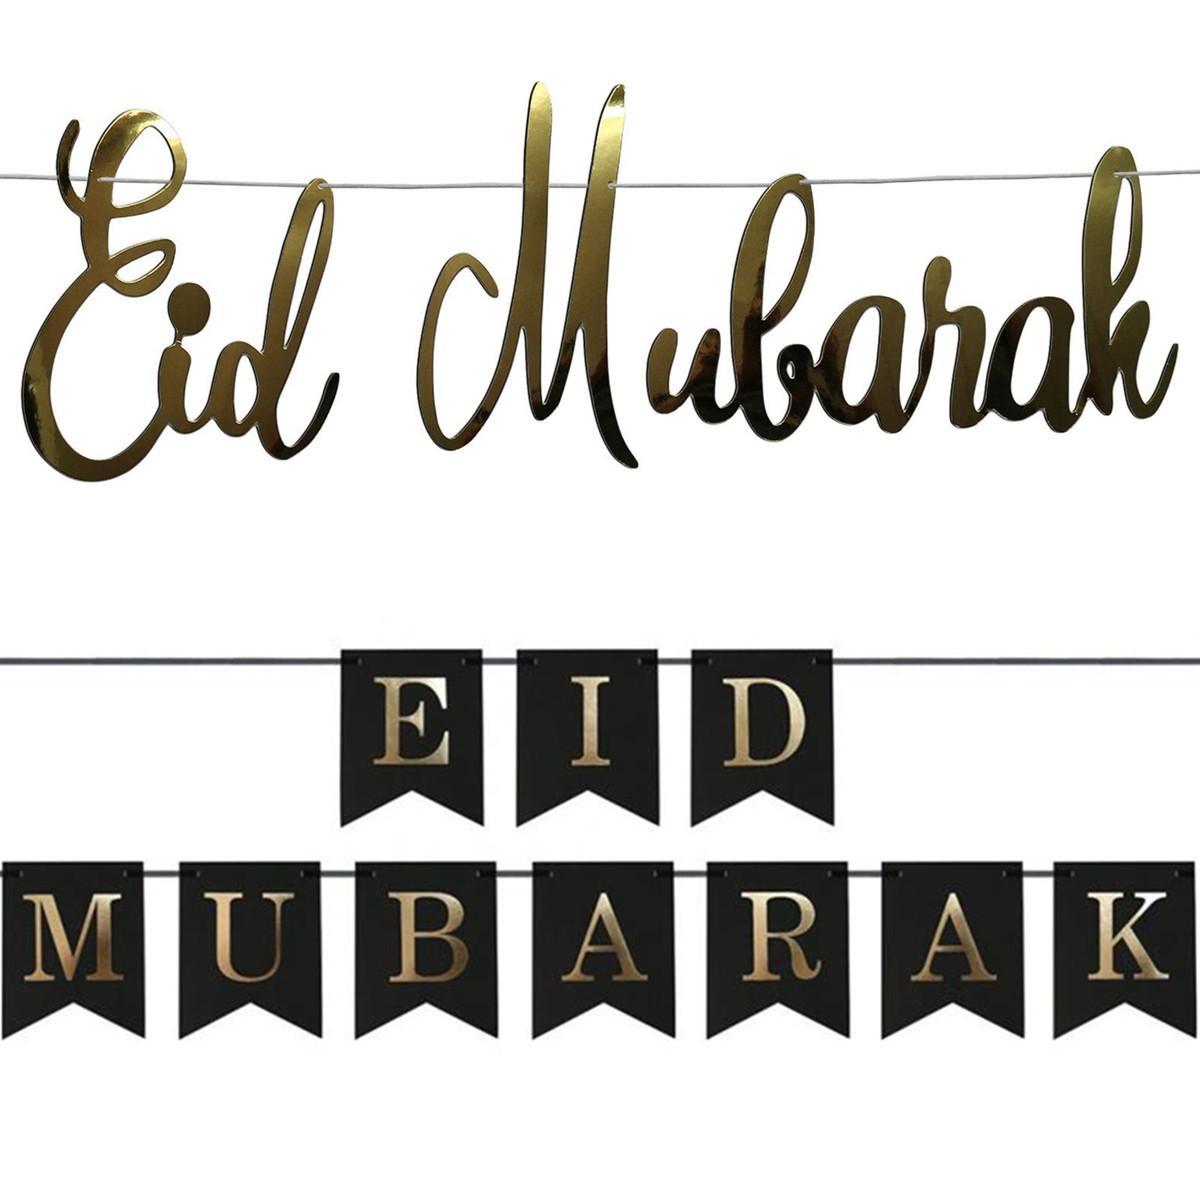 Happy Island 12 15cm Eid Mubarak Ramadan Kareem Pennant Bunting Eid Muslim Islam Decorations Buy Online At Best Prices In Pakistan Daraz Pk